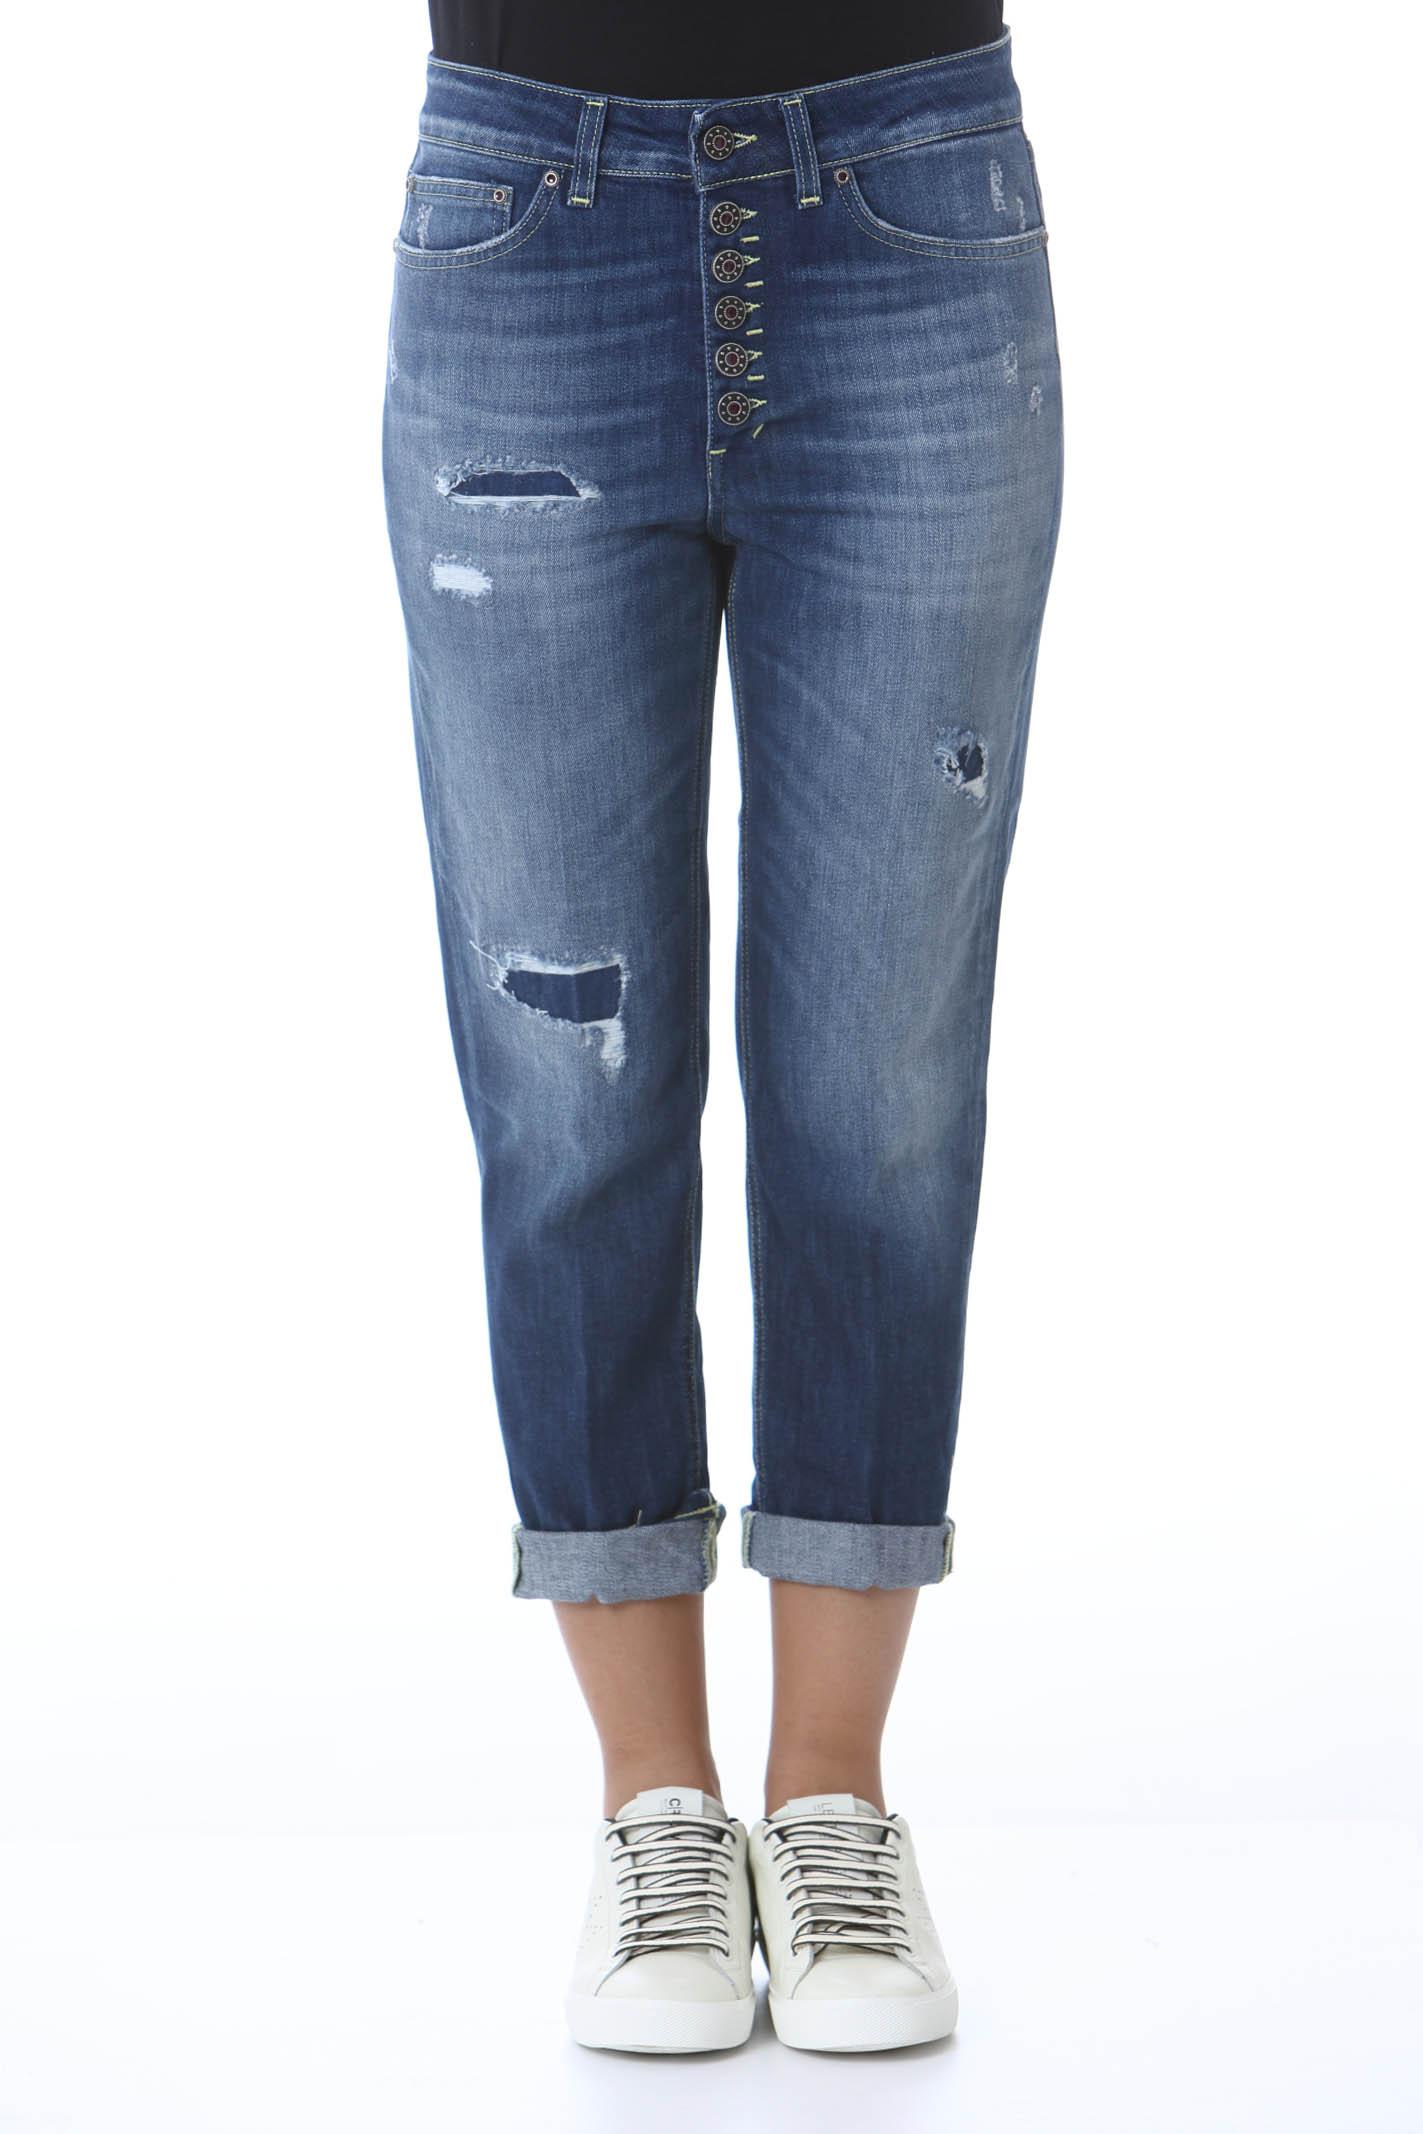 Pantalone donna Koons gioiello DON DUP | Jeans | DP268BDS0107BQ8800